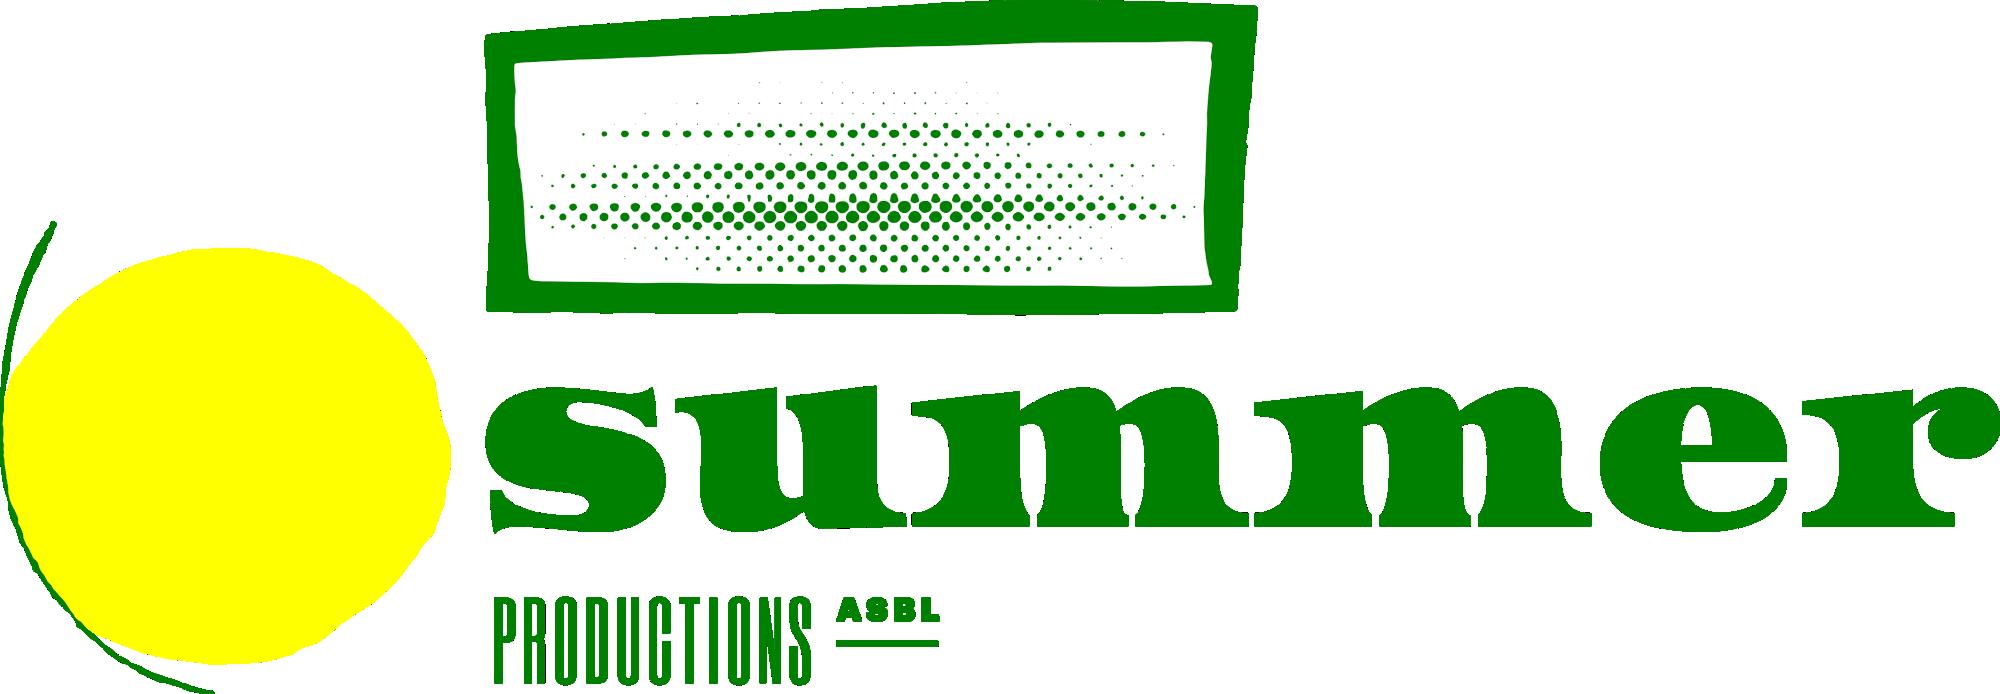 Summer Productions asbl